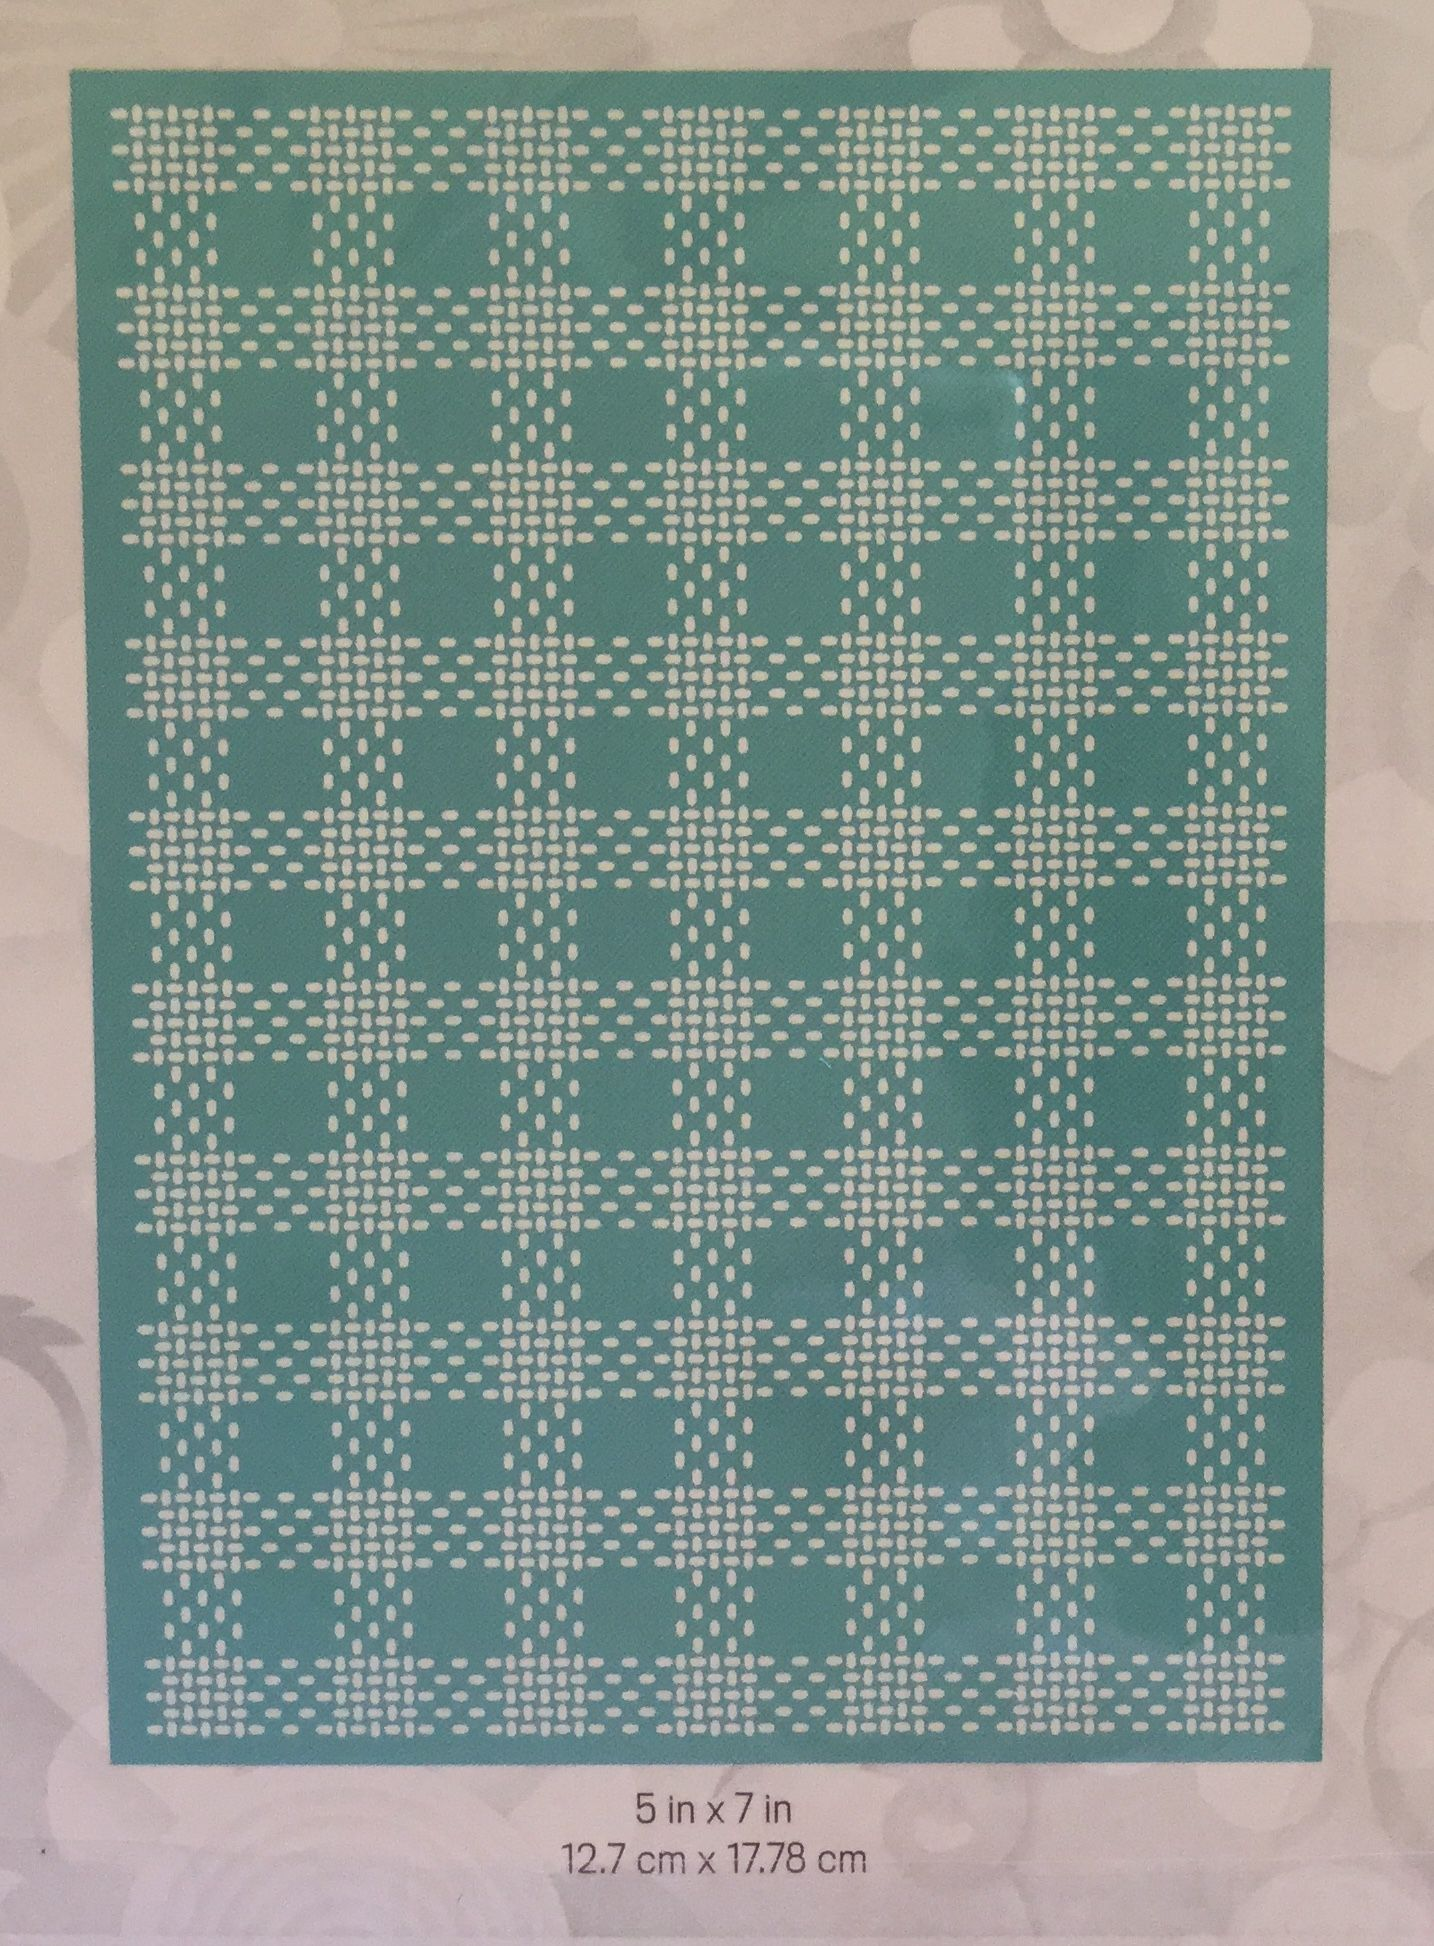 Lifestyle crafts embossing folders - Cricut Cuttlebug Embossing Folder Kitchen Weave